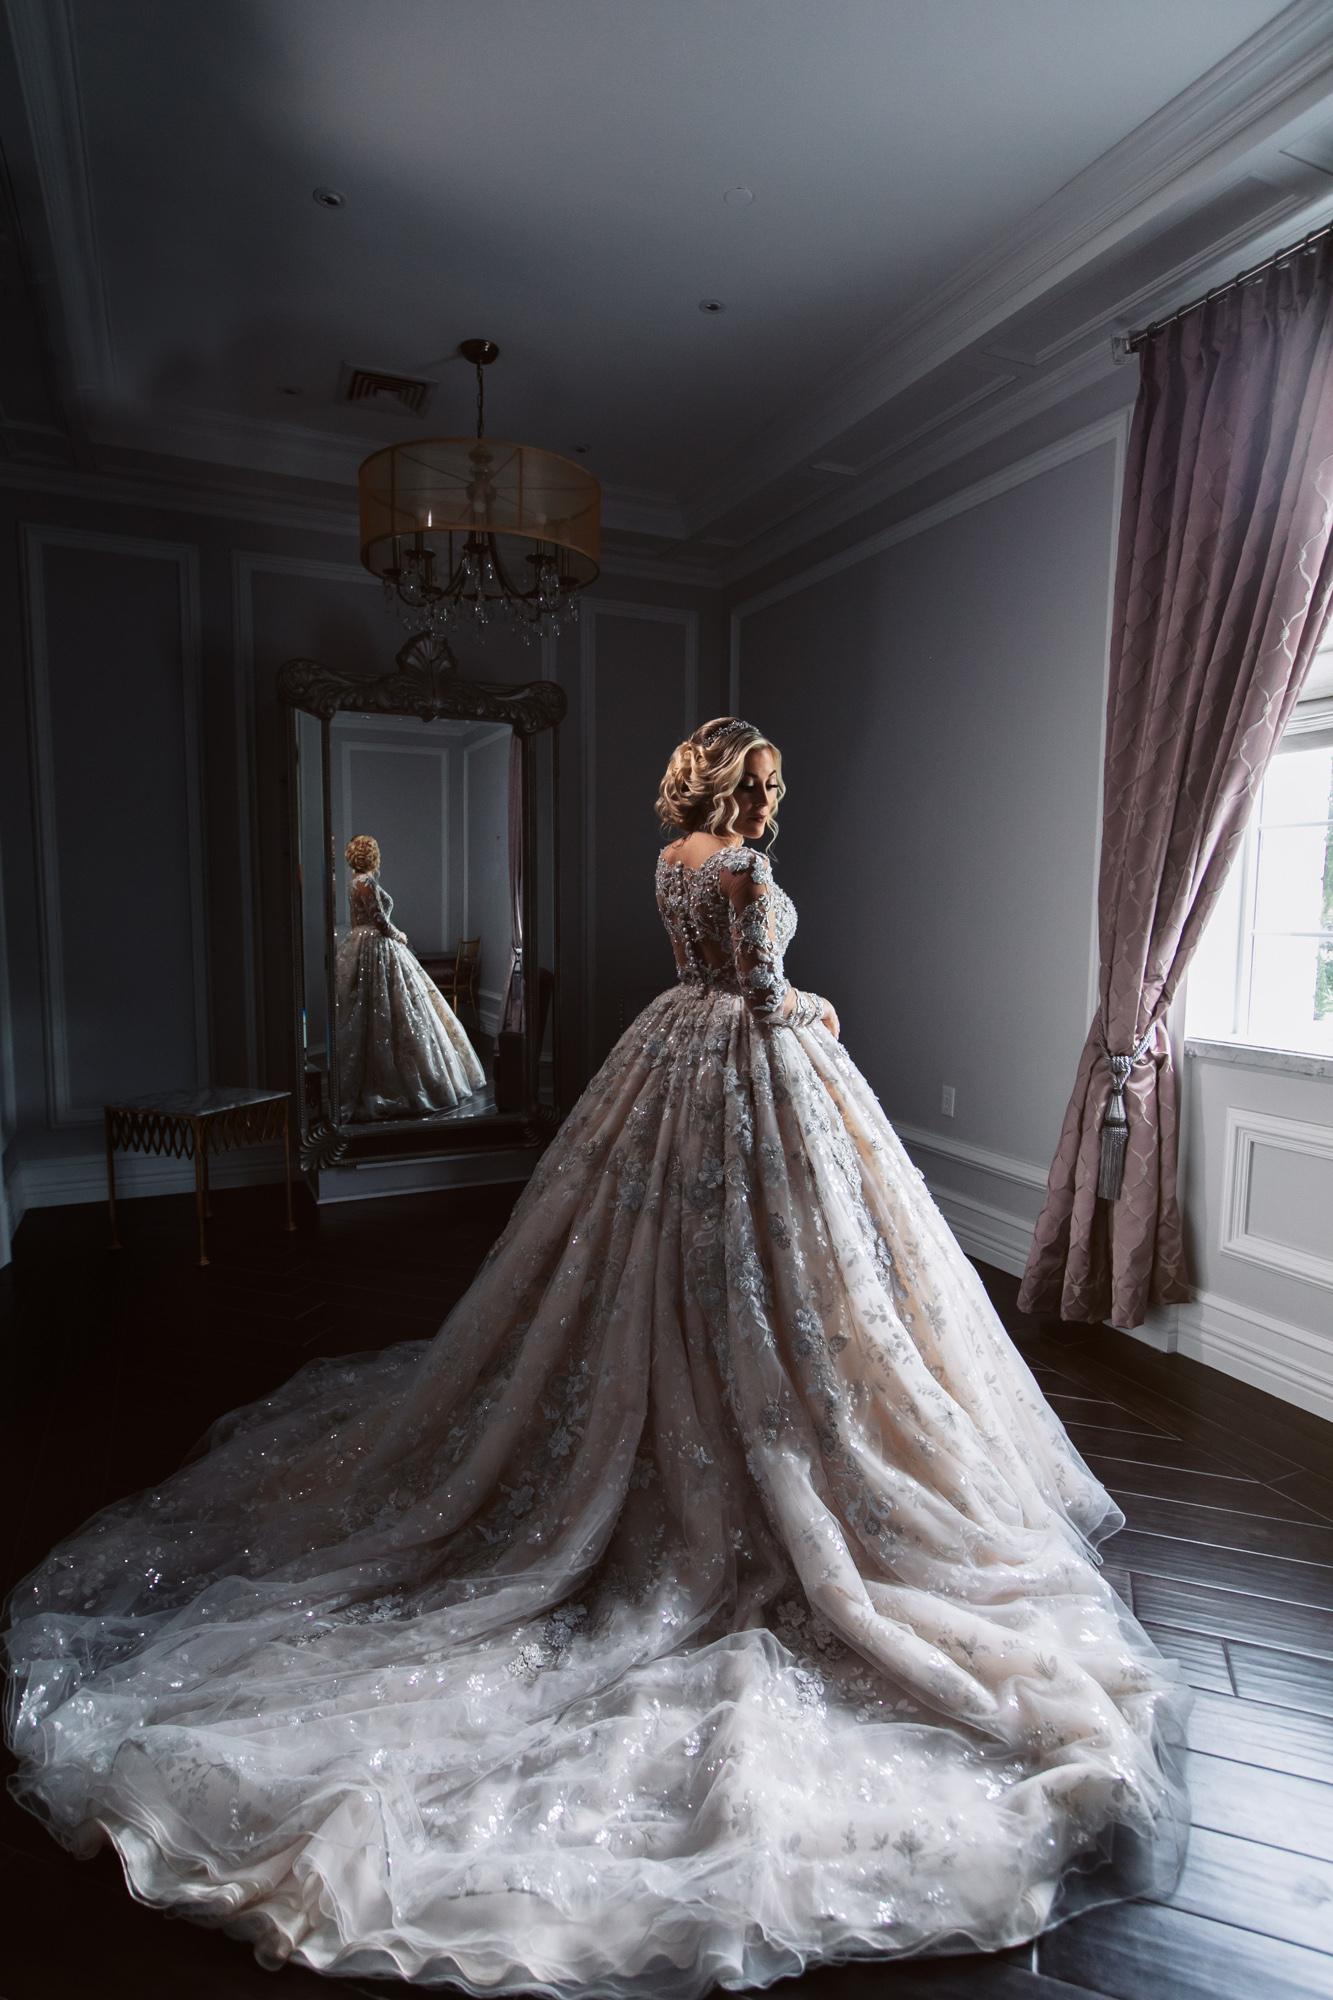 5X2A7268-EditBoris Zaretsky Wedding Photography Rockleigh Wedding Veronika Stan copy.jpg